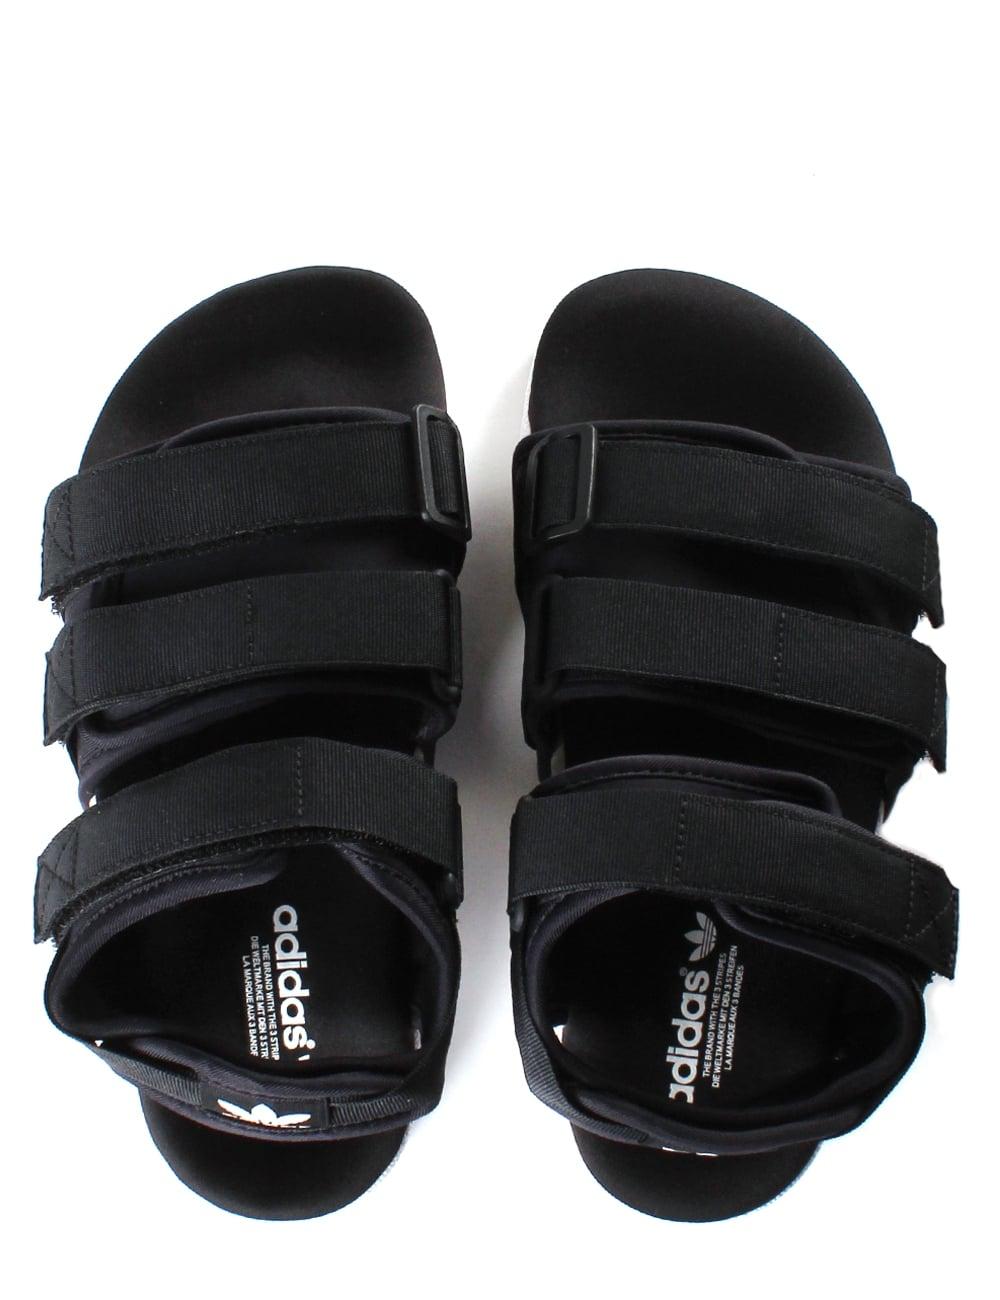 a66d81a3673 Adidas Women s Adilette Sandal